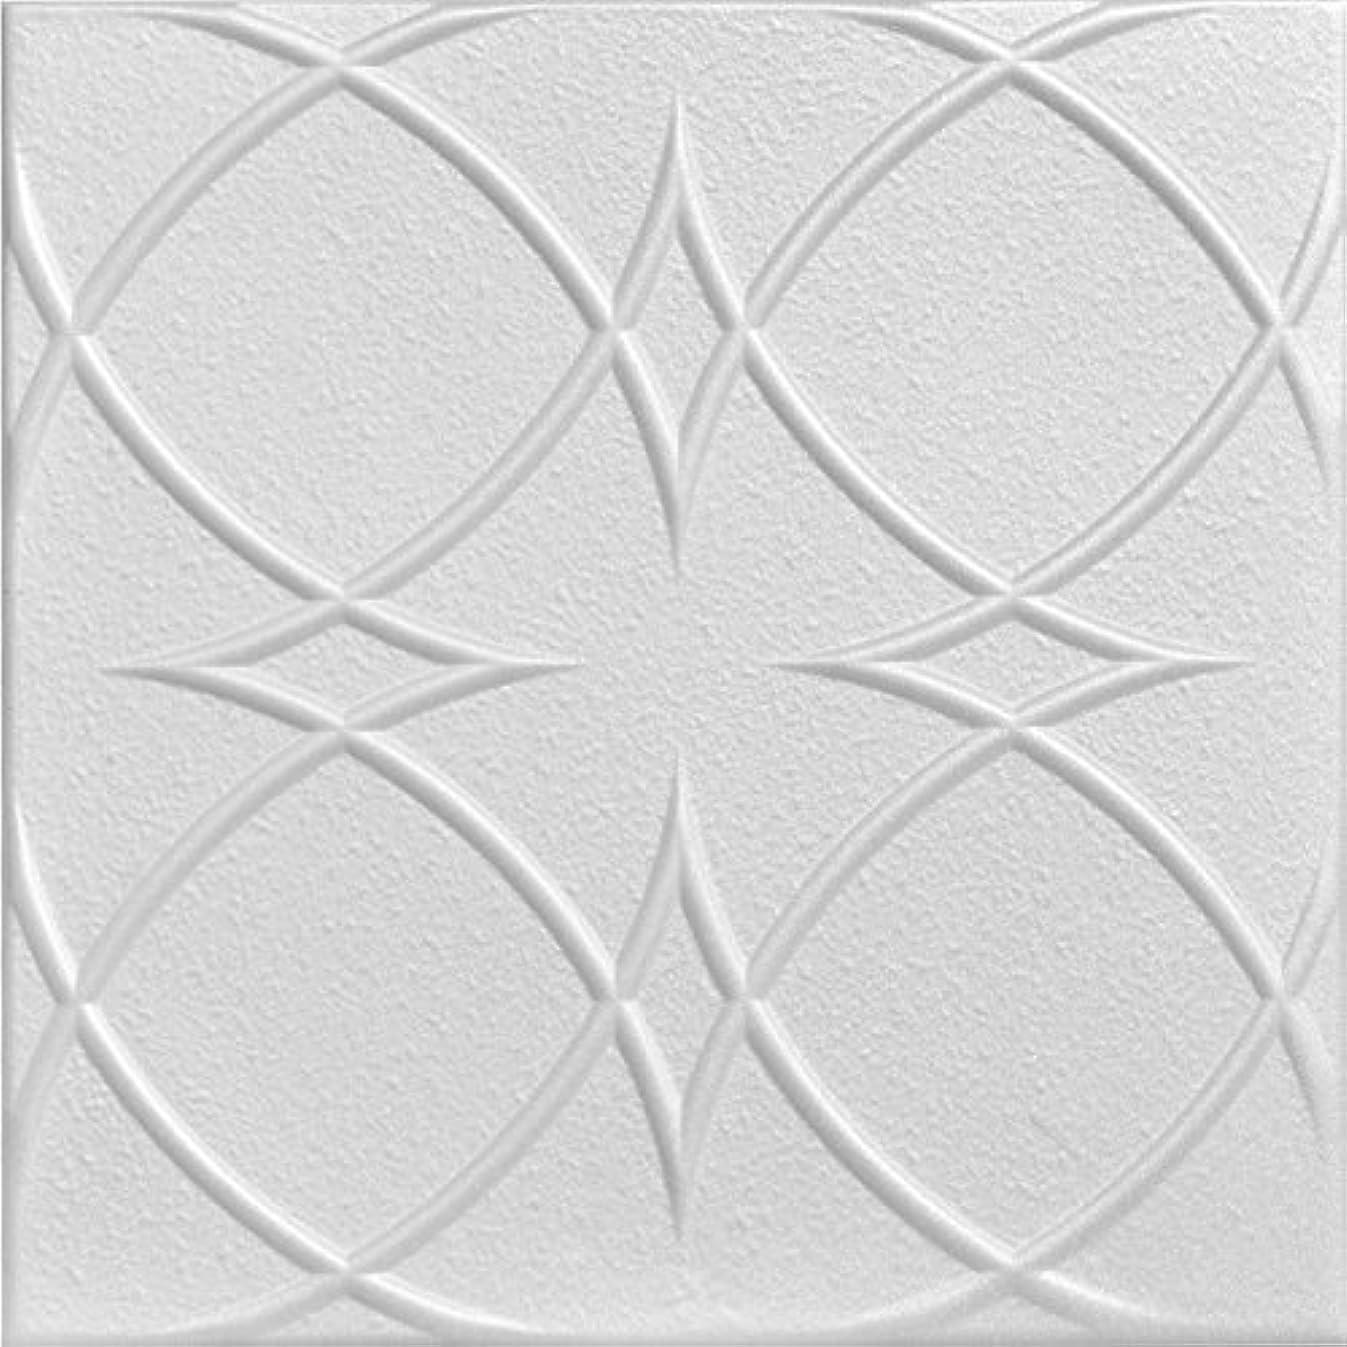 A la Maison Ceilings 1458 Circles and Stars - Styrofoam Ceiling Tile (Package of 8 Tiles), Plain White